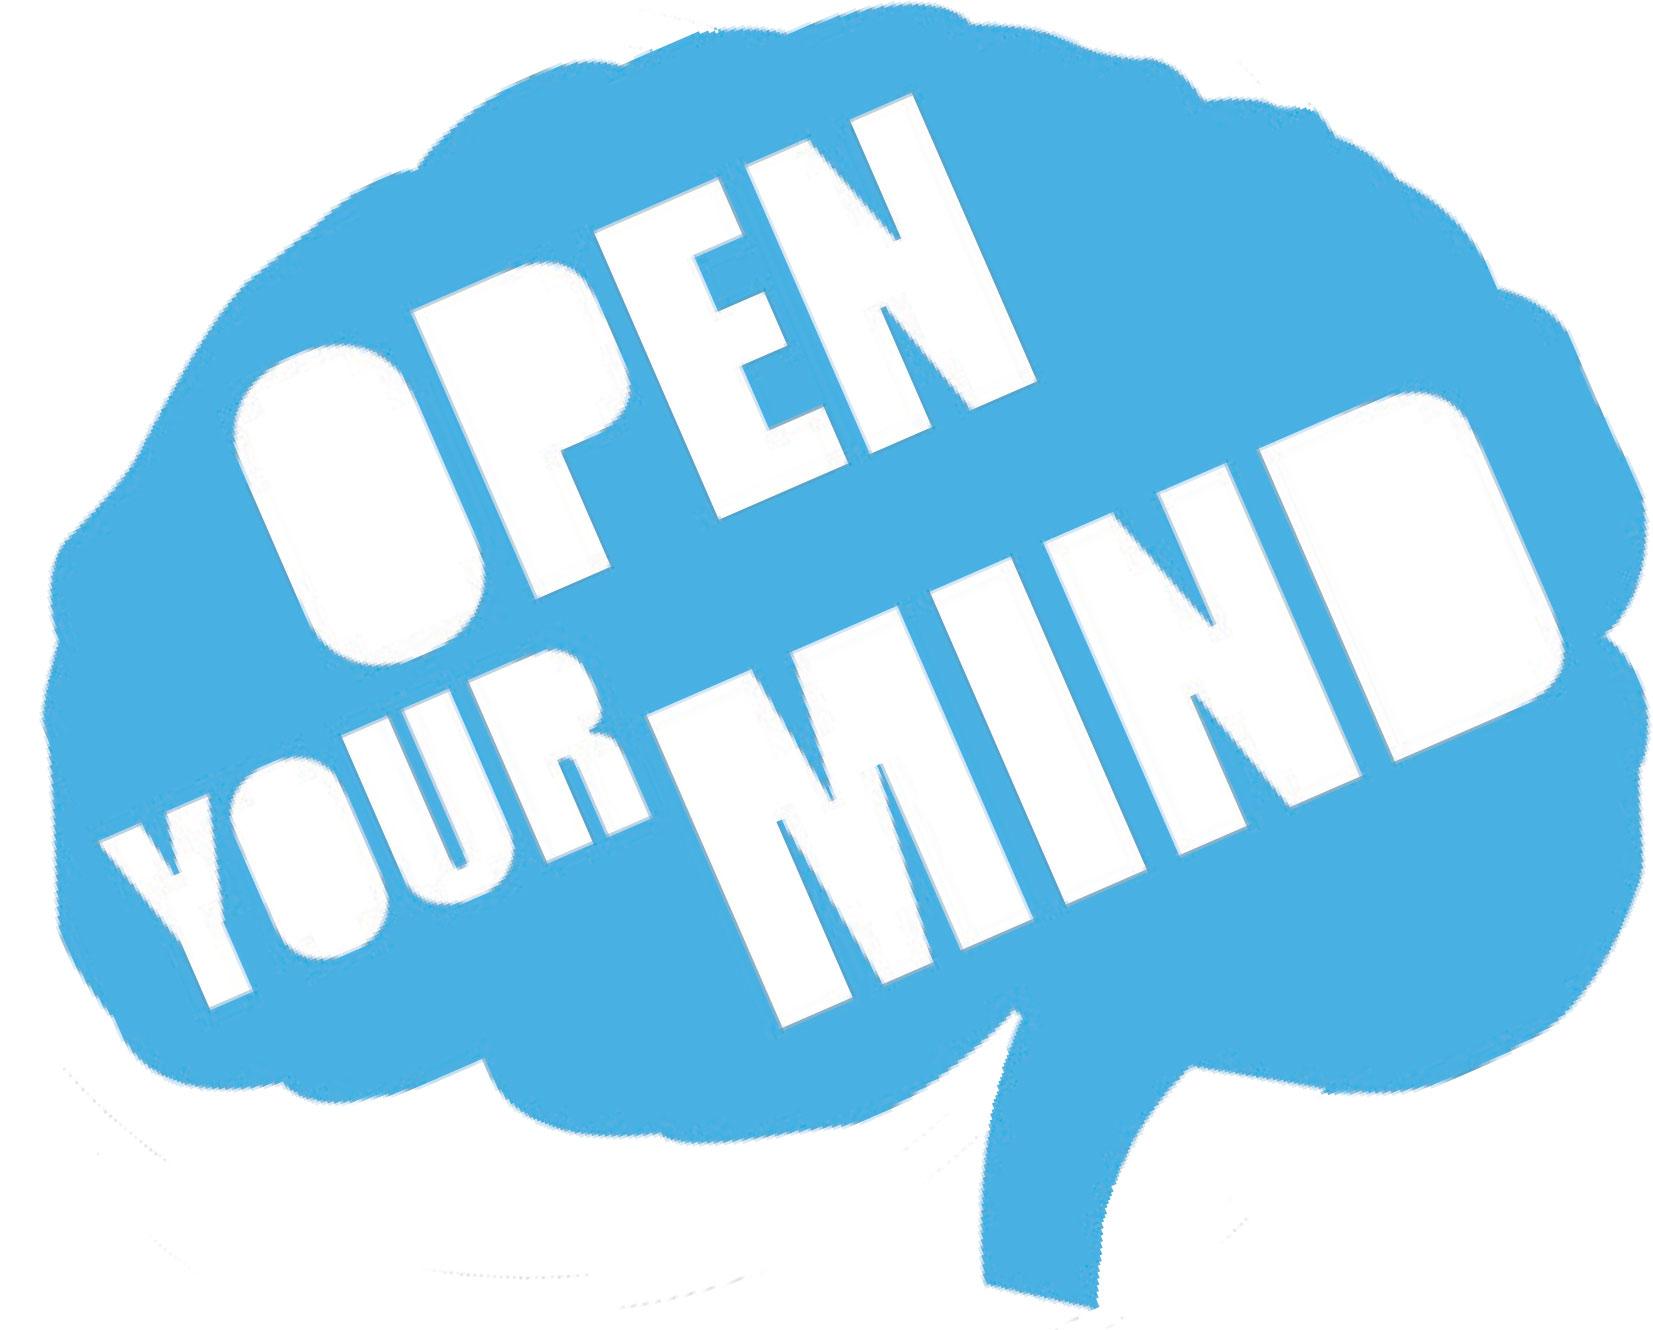 Good News About Mental Health In Our >> Mental Health Awareness Week Consett Magazine Consett Deserves